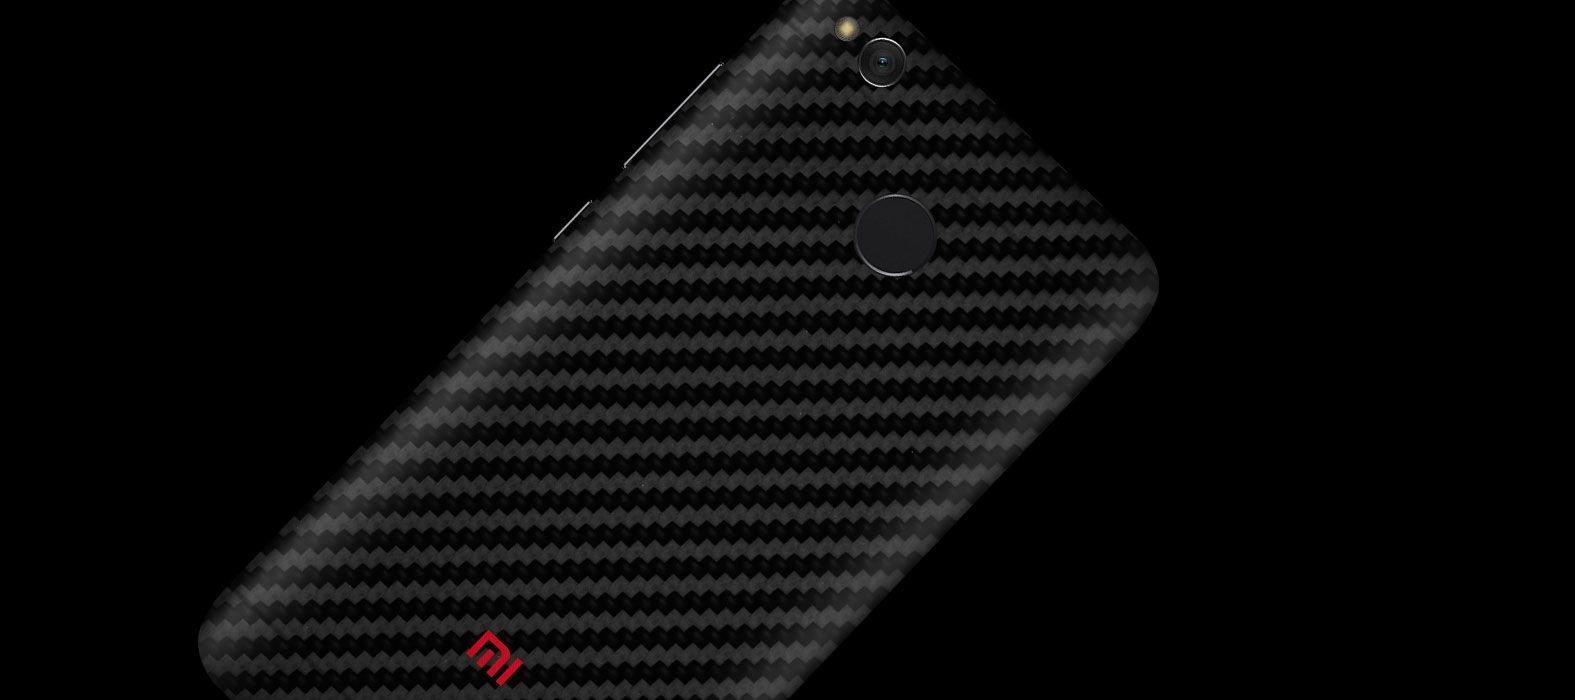 Black carbon Redmi 4 (4x) skins, wraps & decals